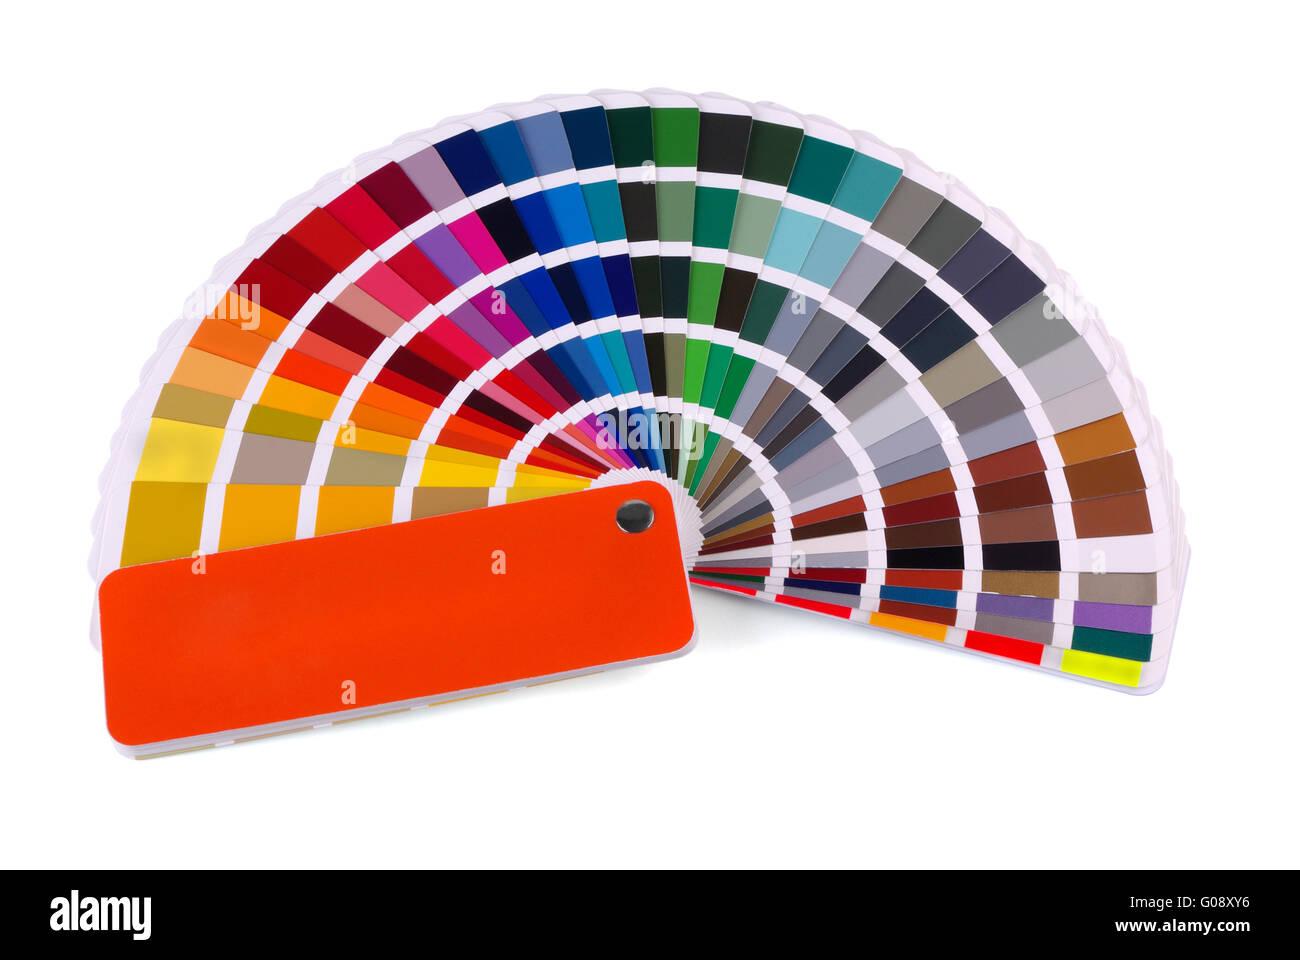 Abstract Coloring Book Stock Photos & Abstract Coloring Book Stock ...